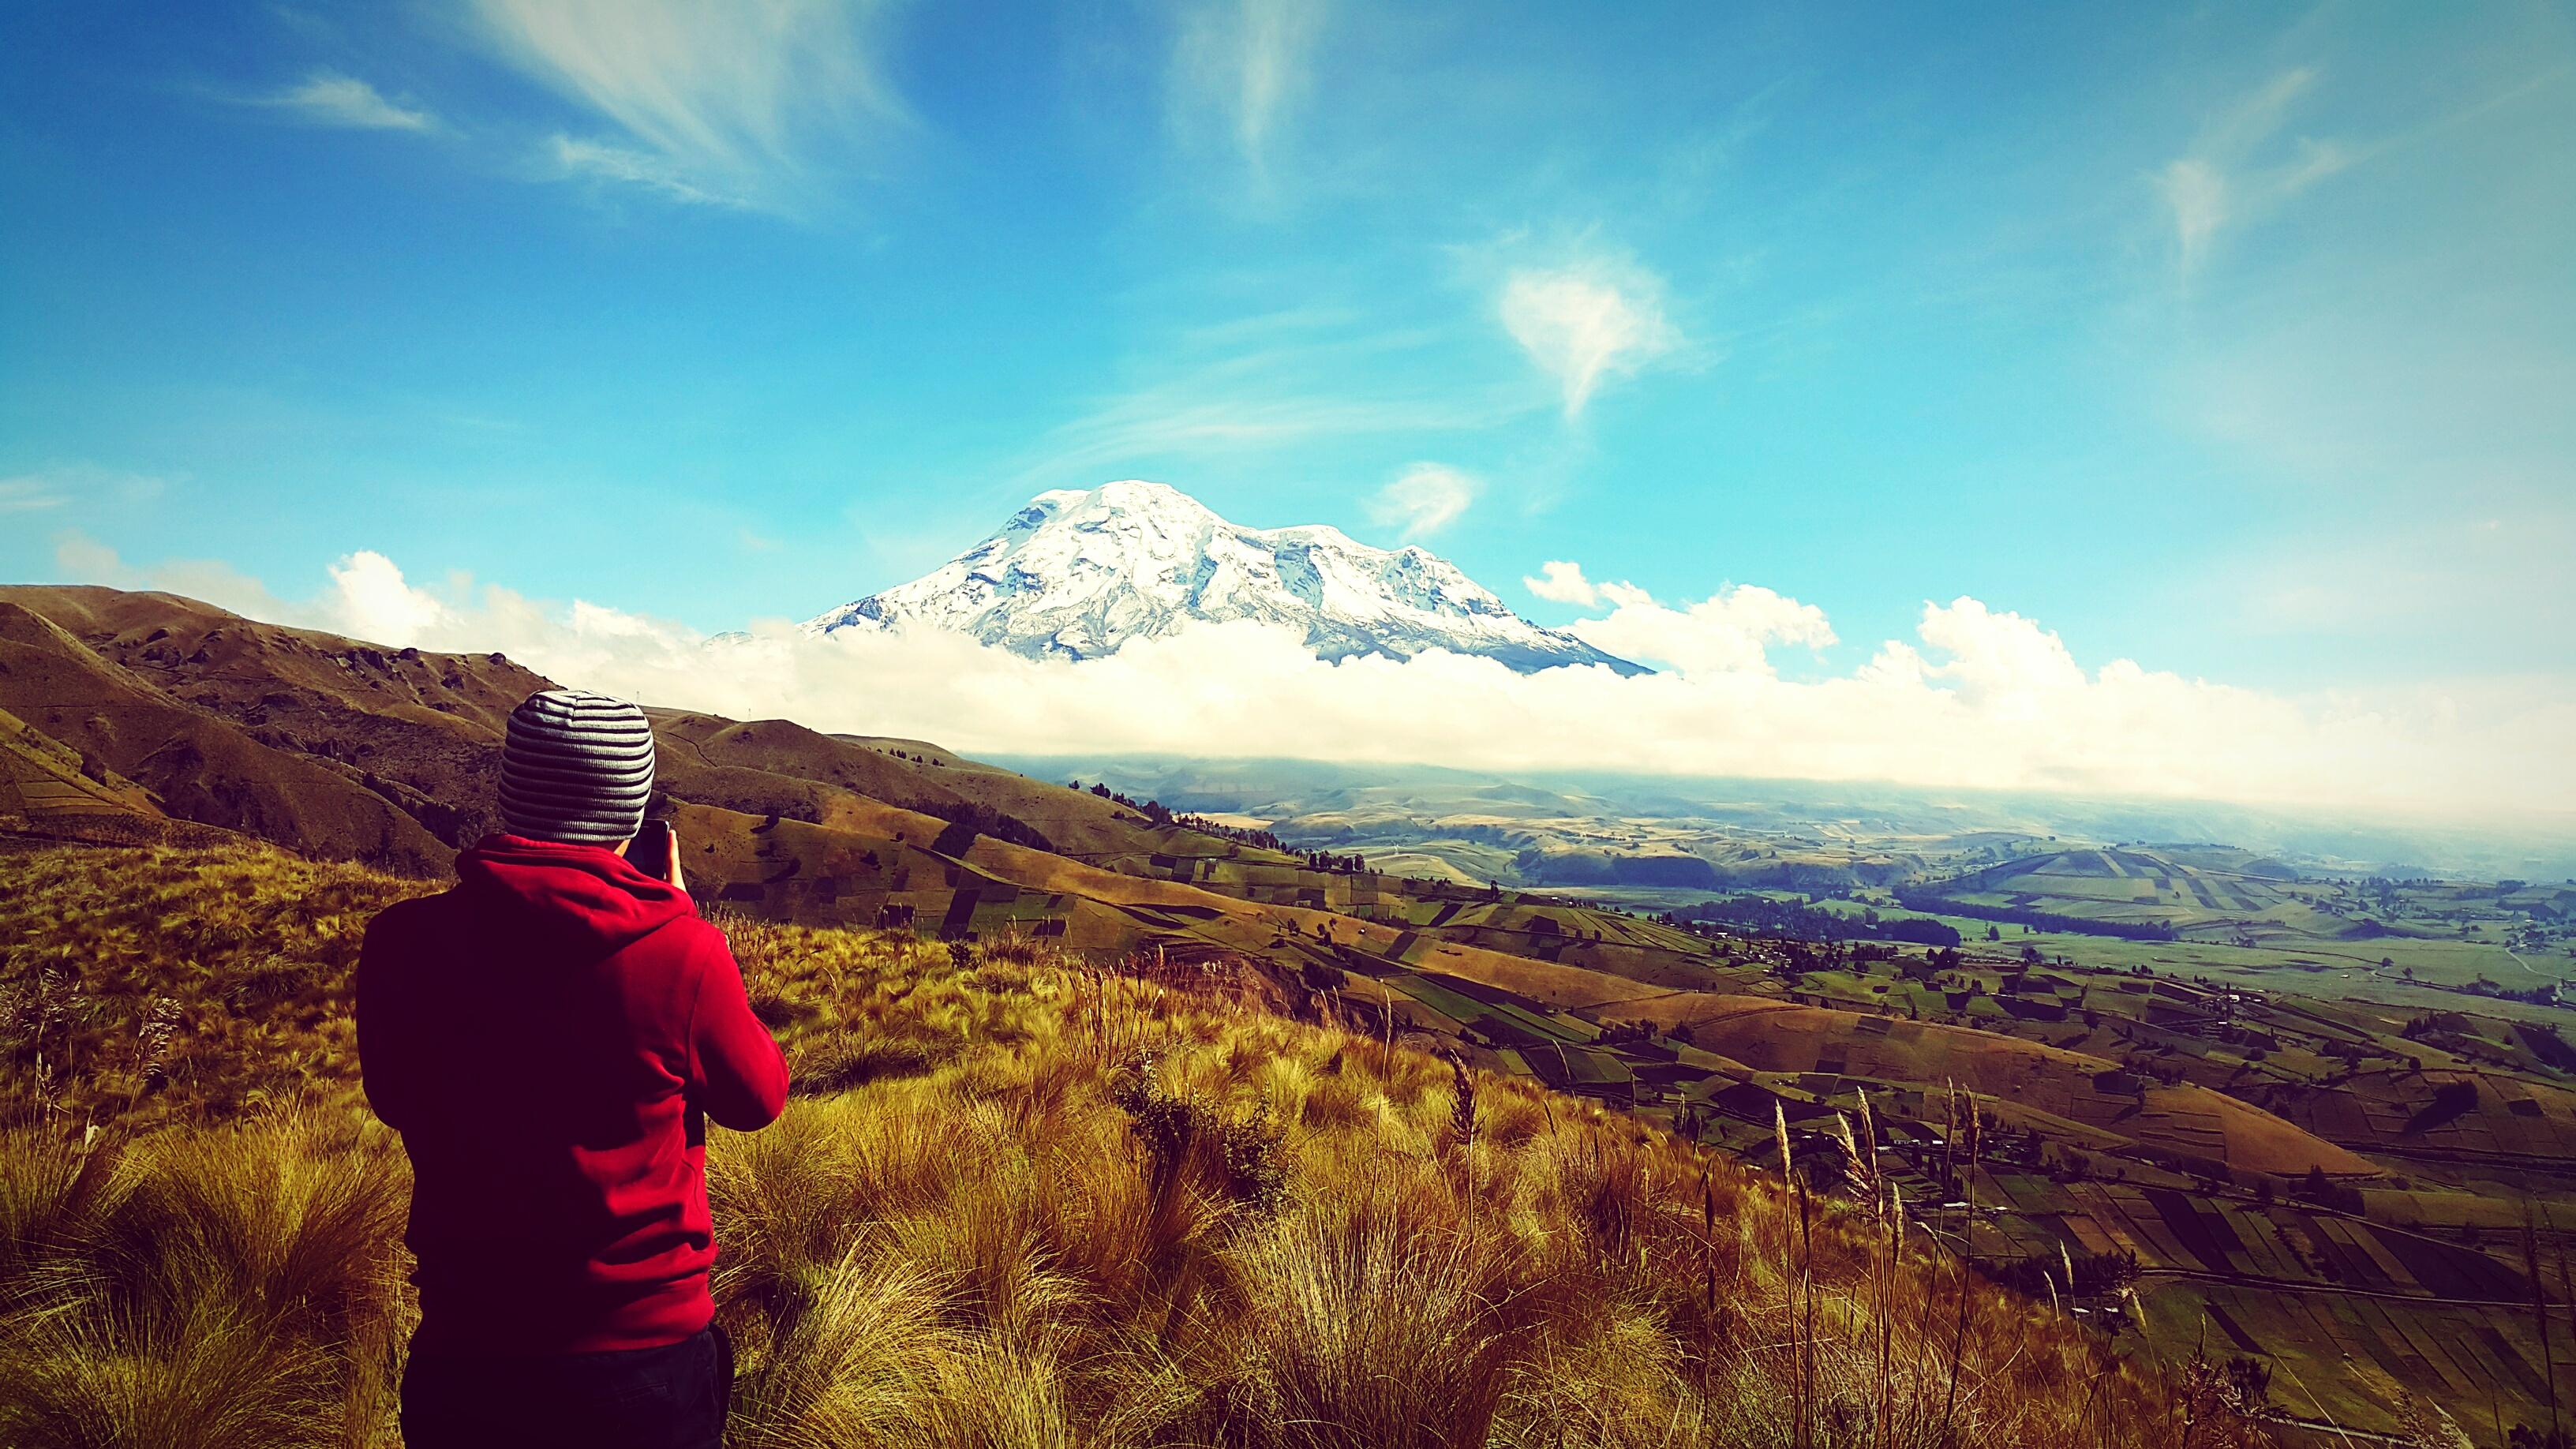 Volcán Chimborazo en Ecuador